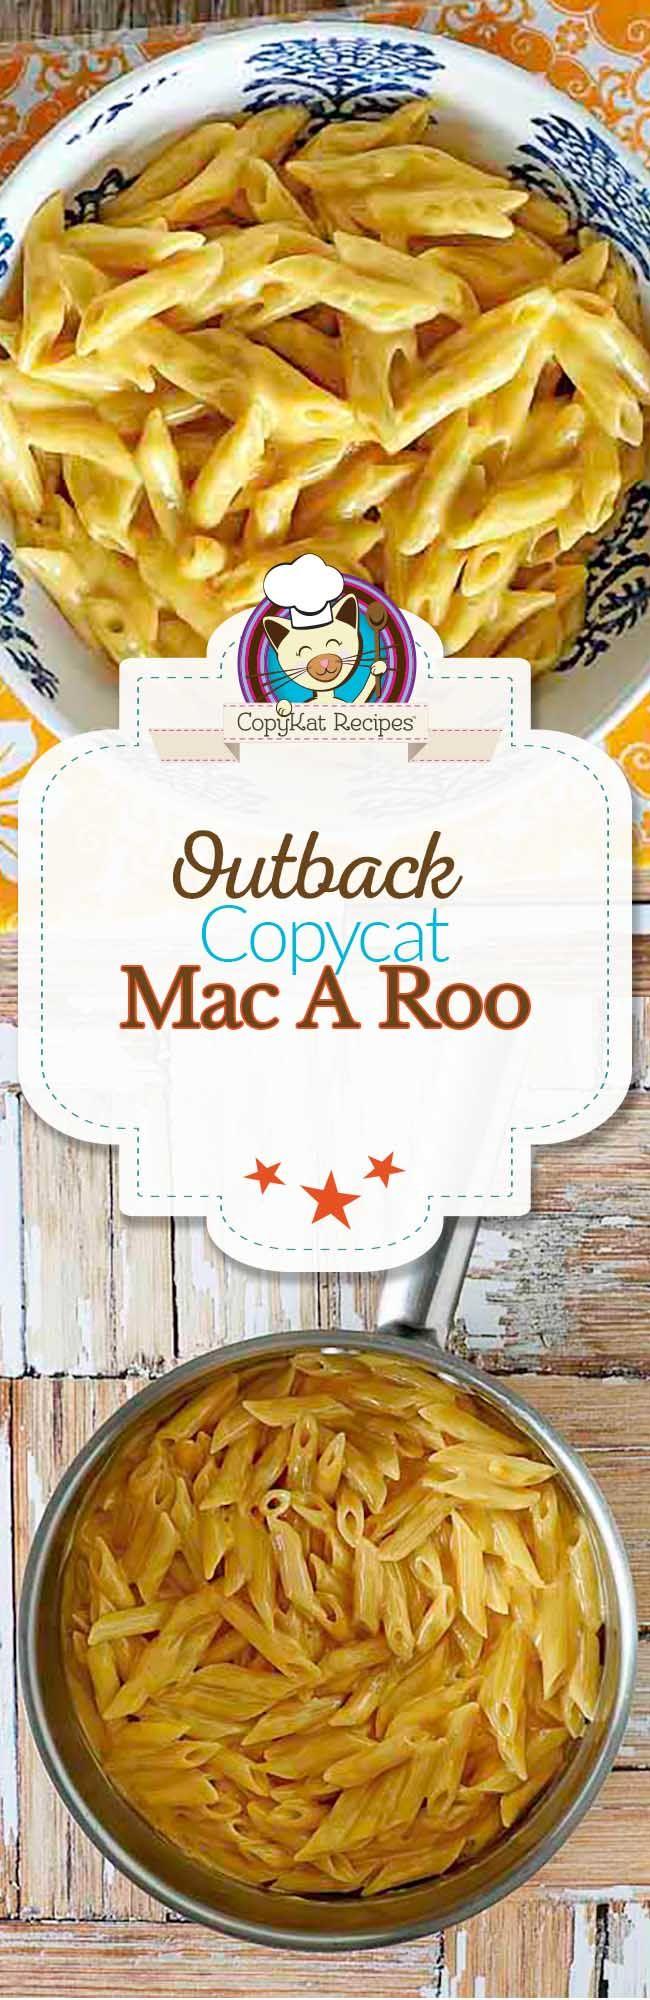 Outbank Mac